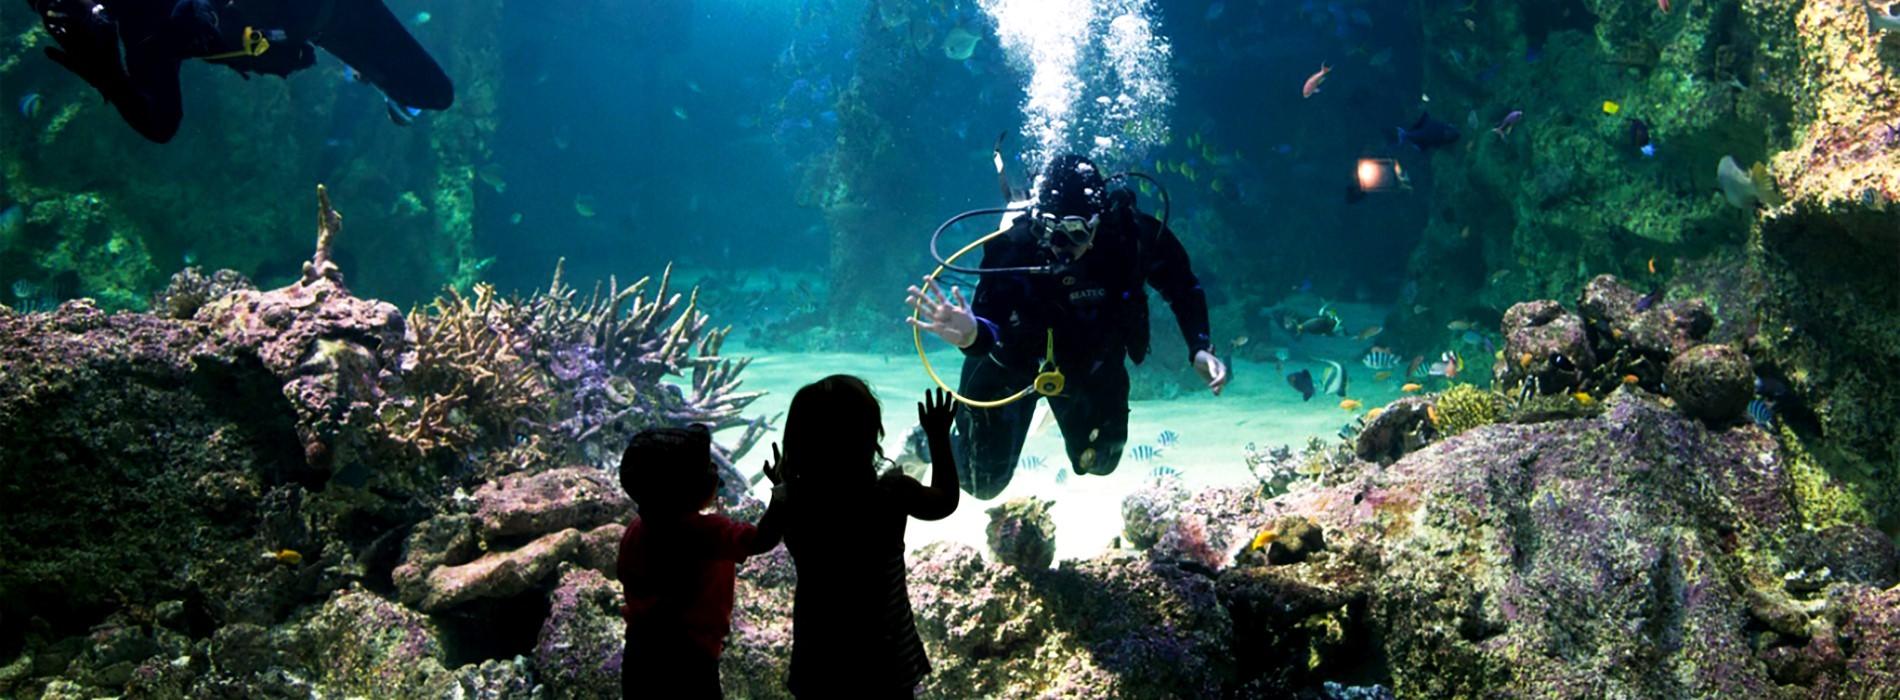 Sea Life Sydney Aquarium Tickets Kkday Thailand Et Ticket Ocean World Only Child